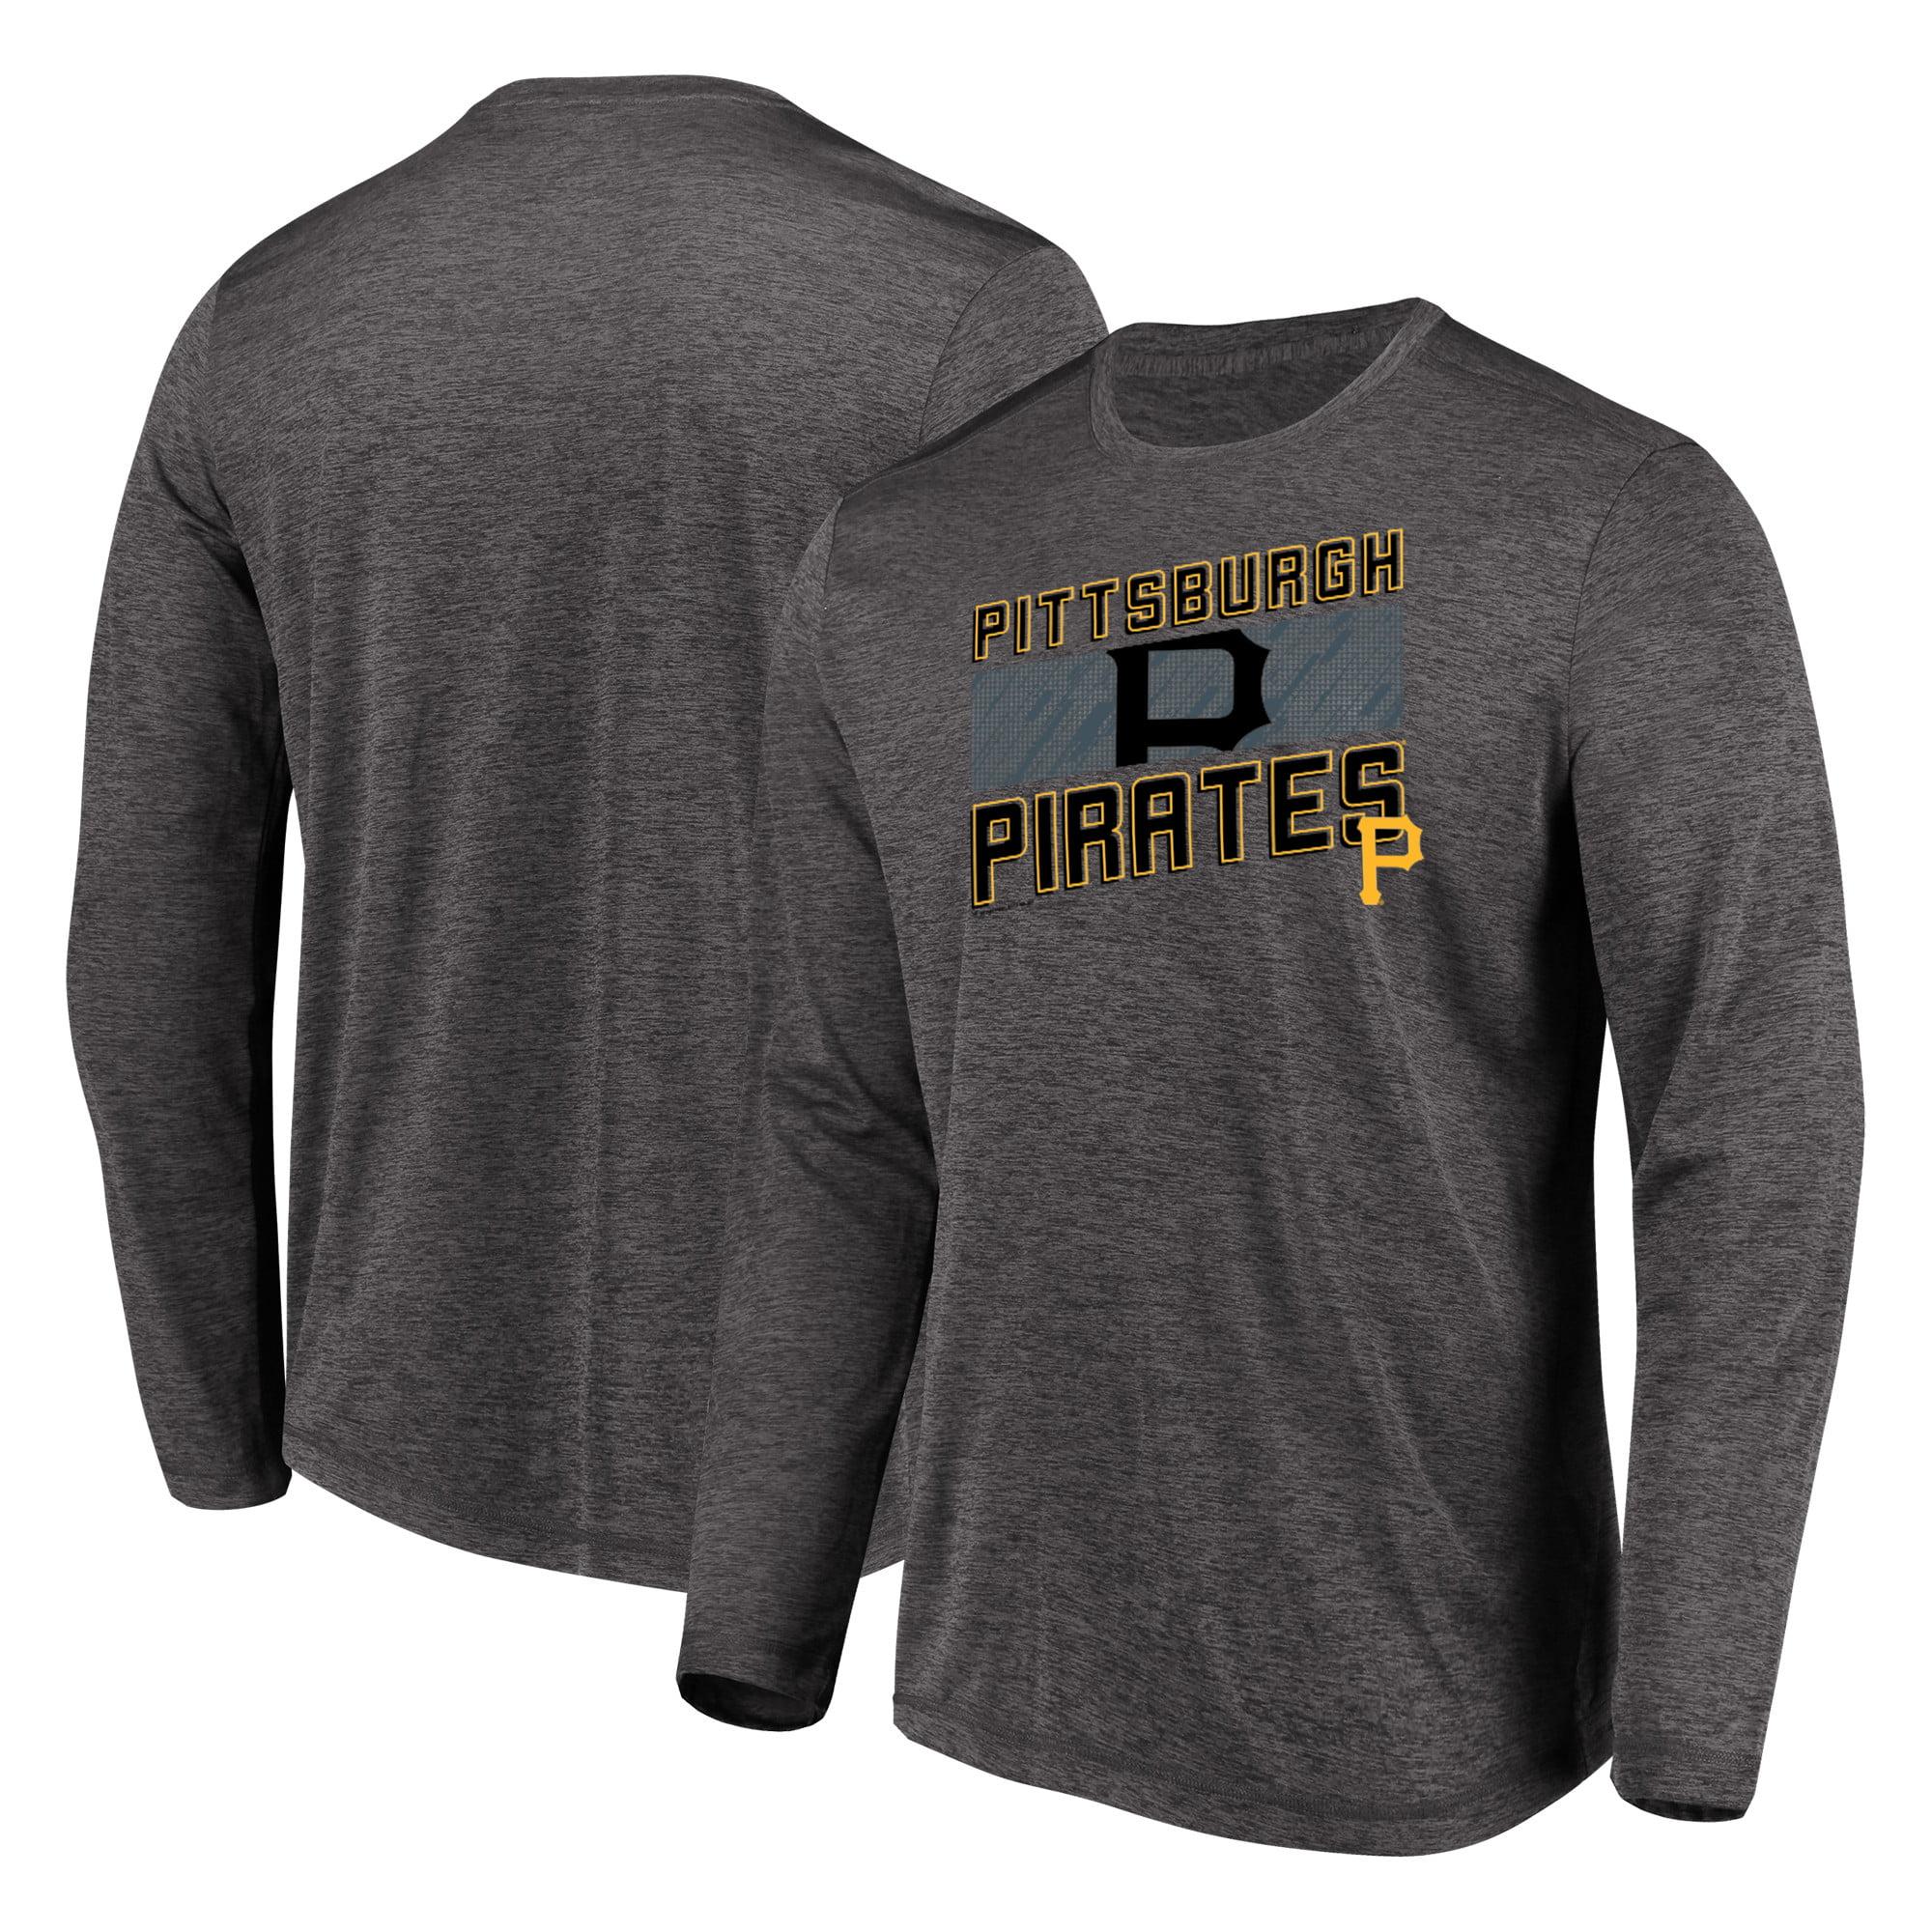 Men's Majestic Heathered Charcoal Pittsburgh Pirates Big & Tall Long Sleeve Team T-Shirt